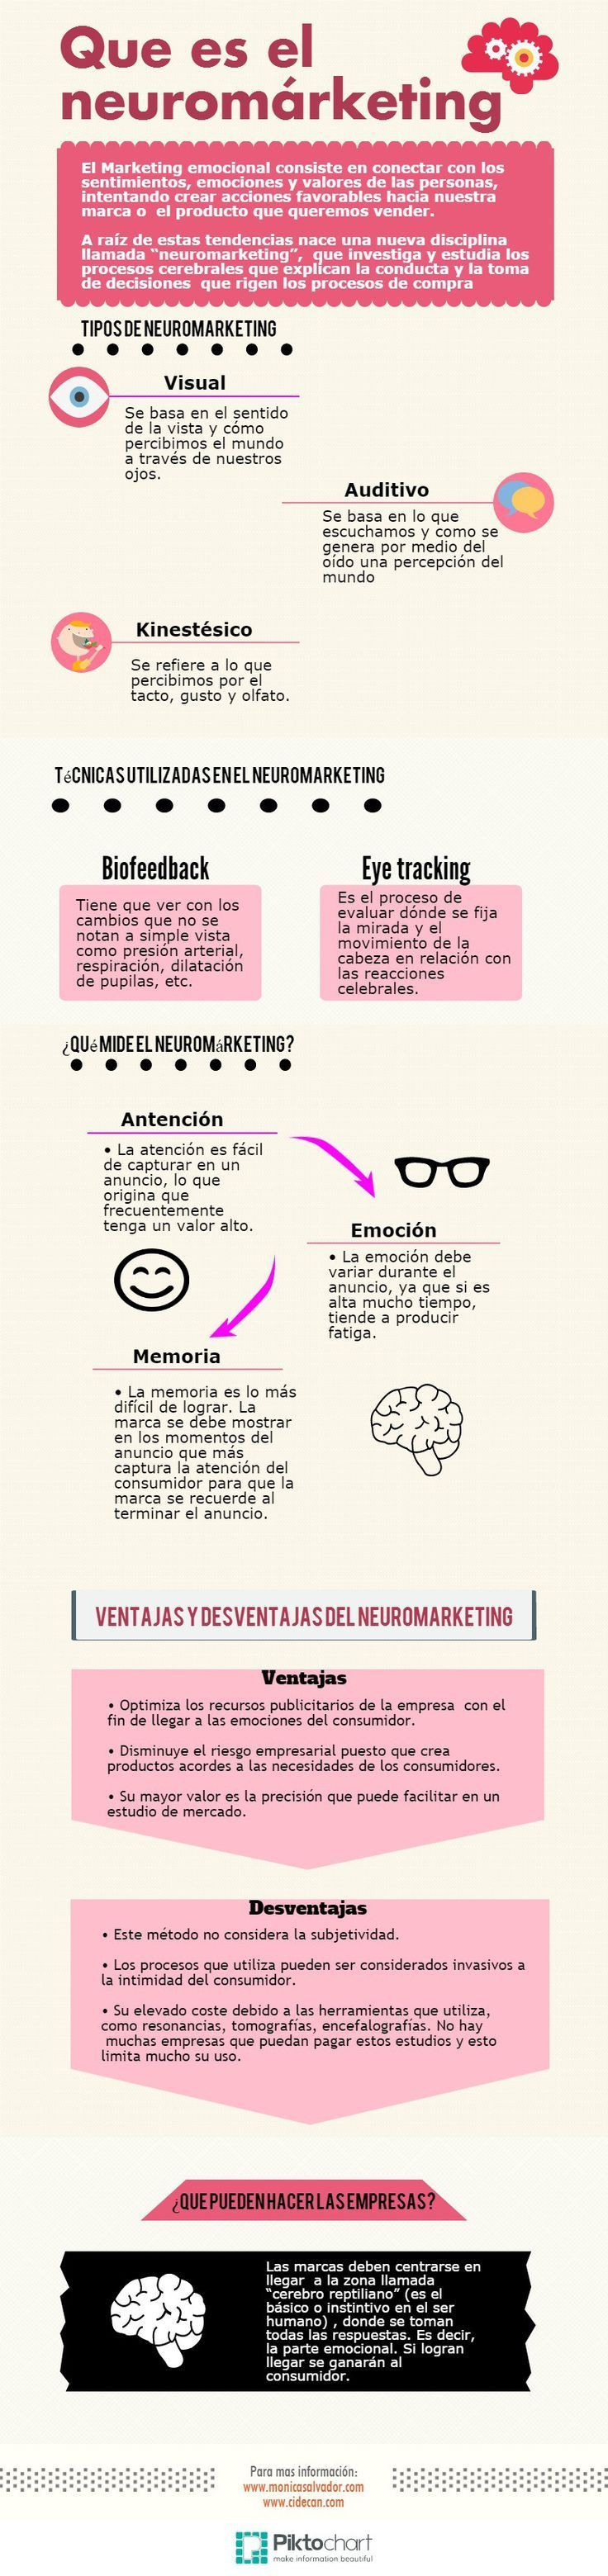 Cómo utilizar el #neuromarketing | www.neuromarketingytecnologia.com/blog